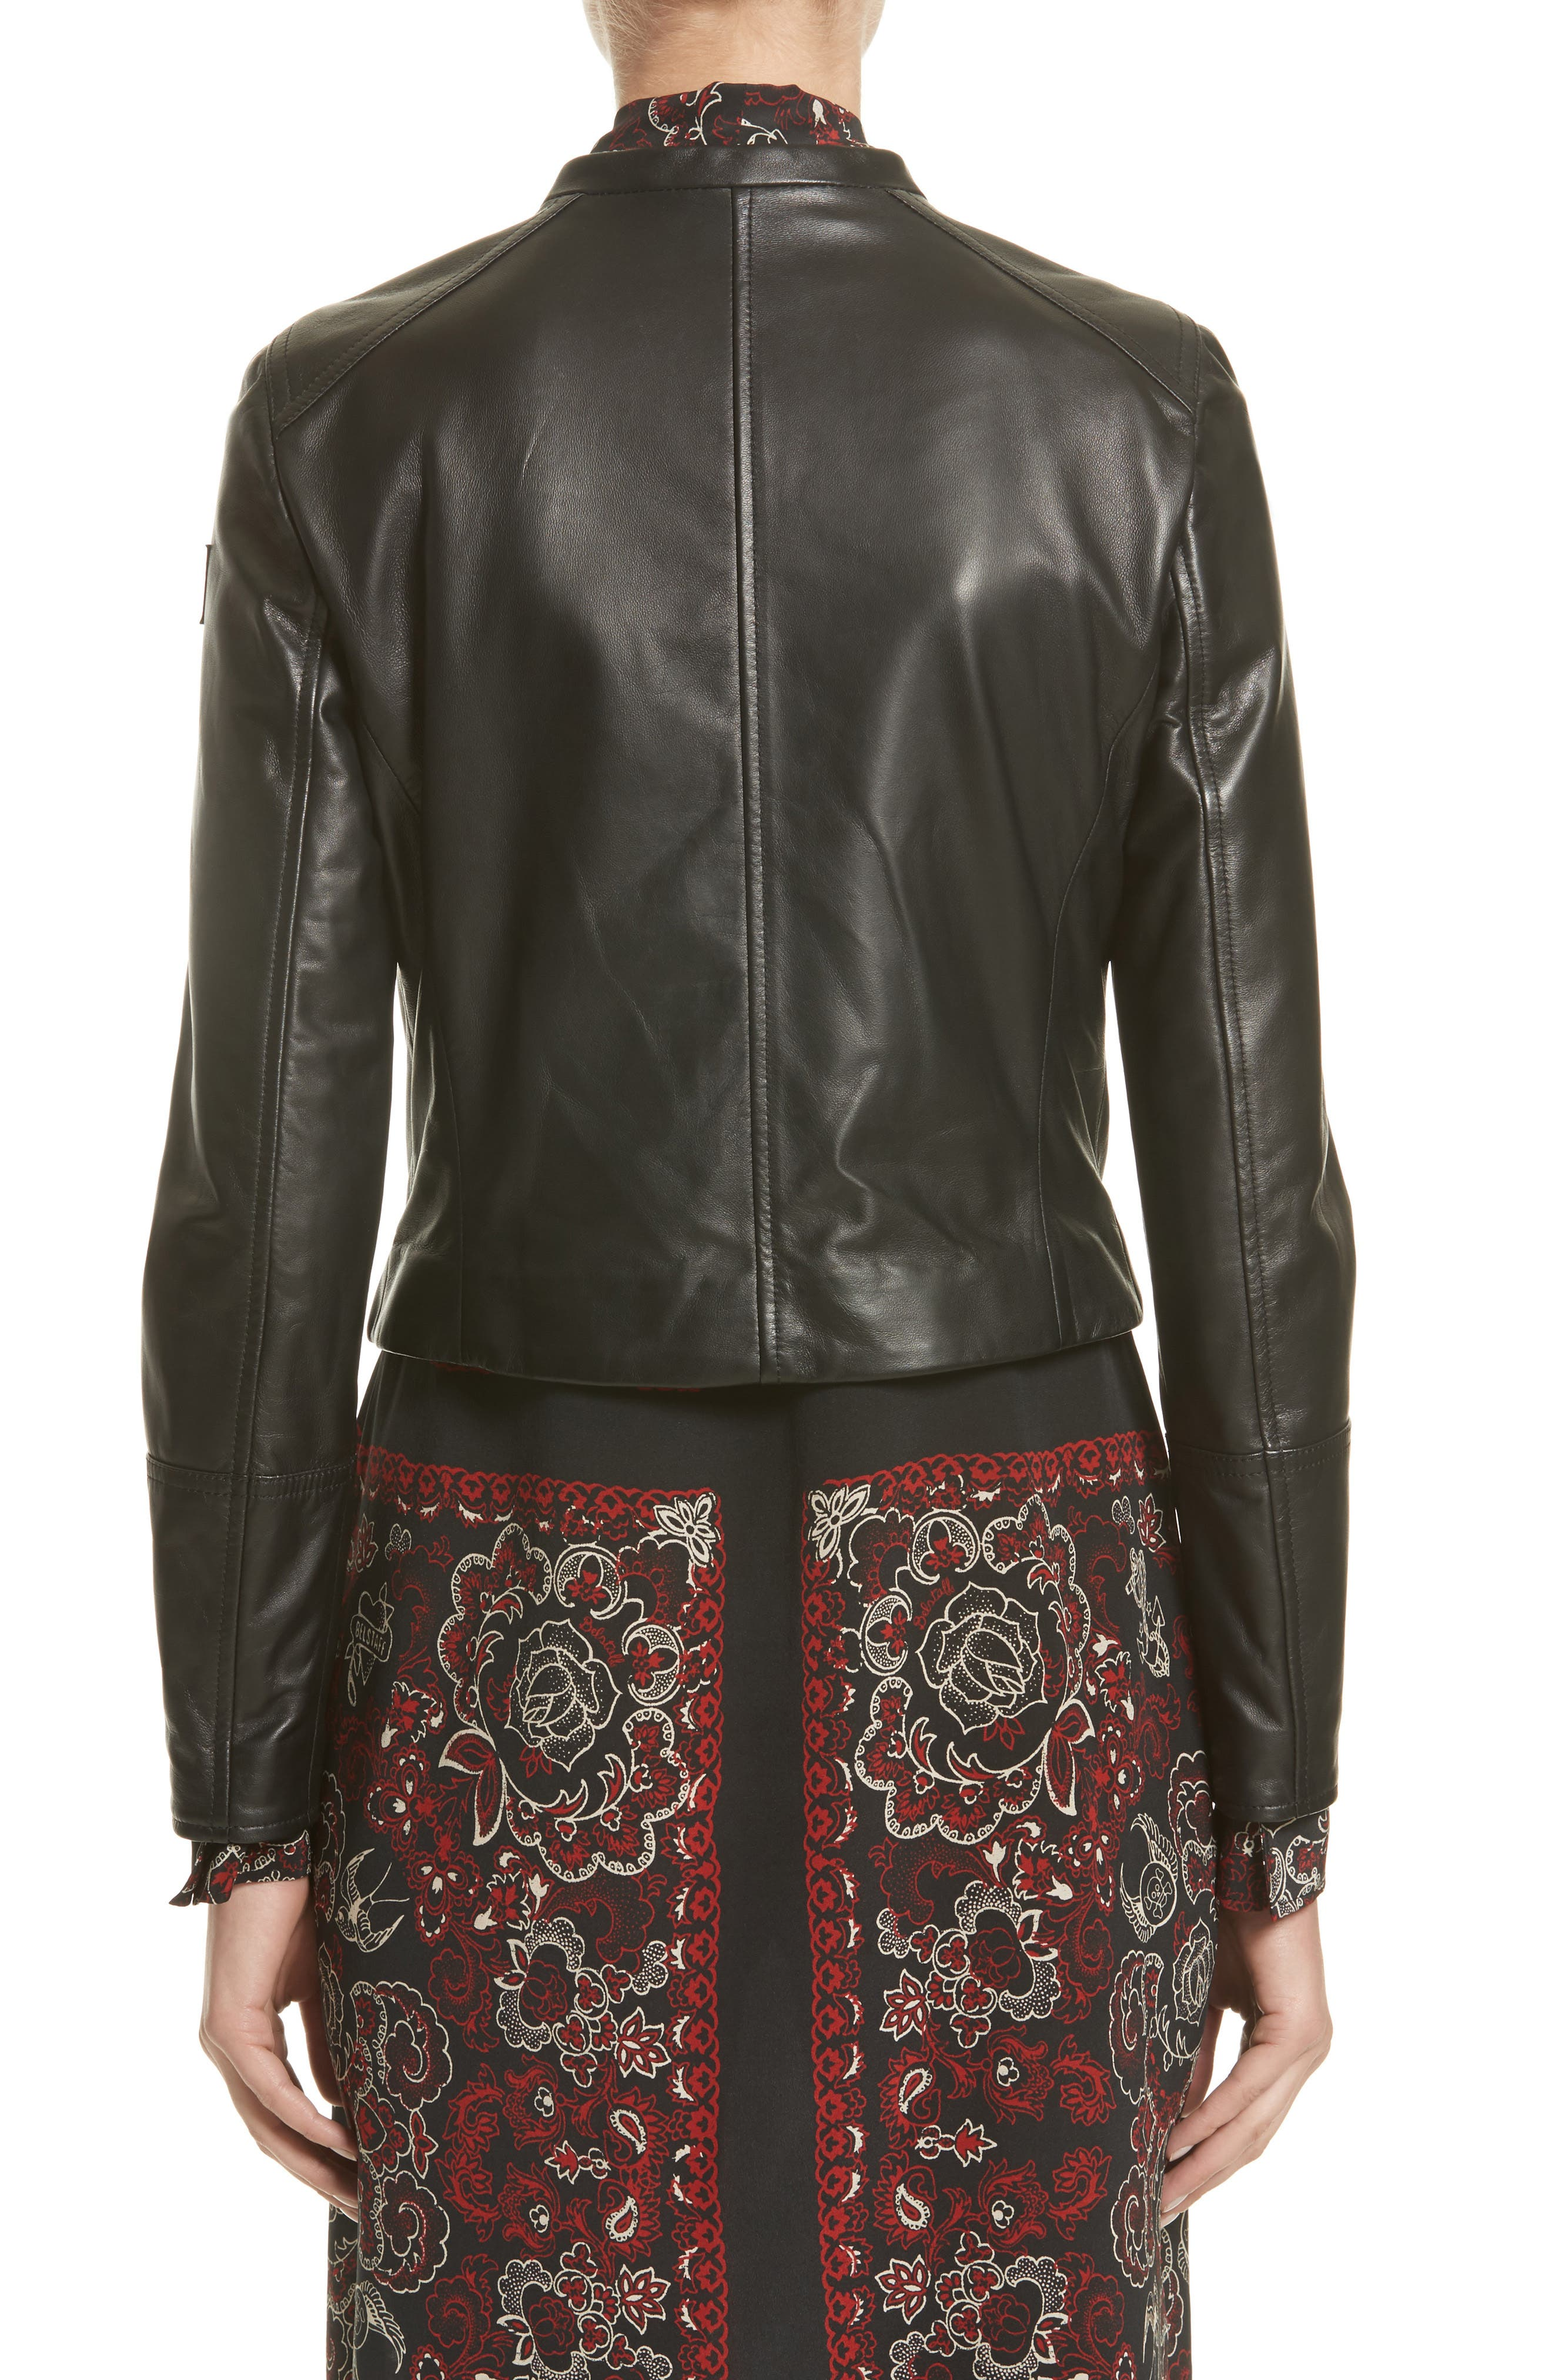 Carrack Leather Jacket,                             Alternate thumbnail 2, color,                             001